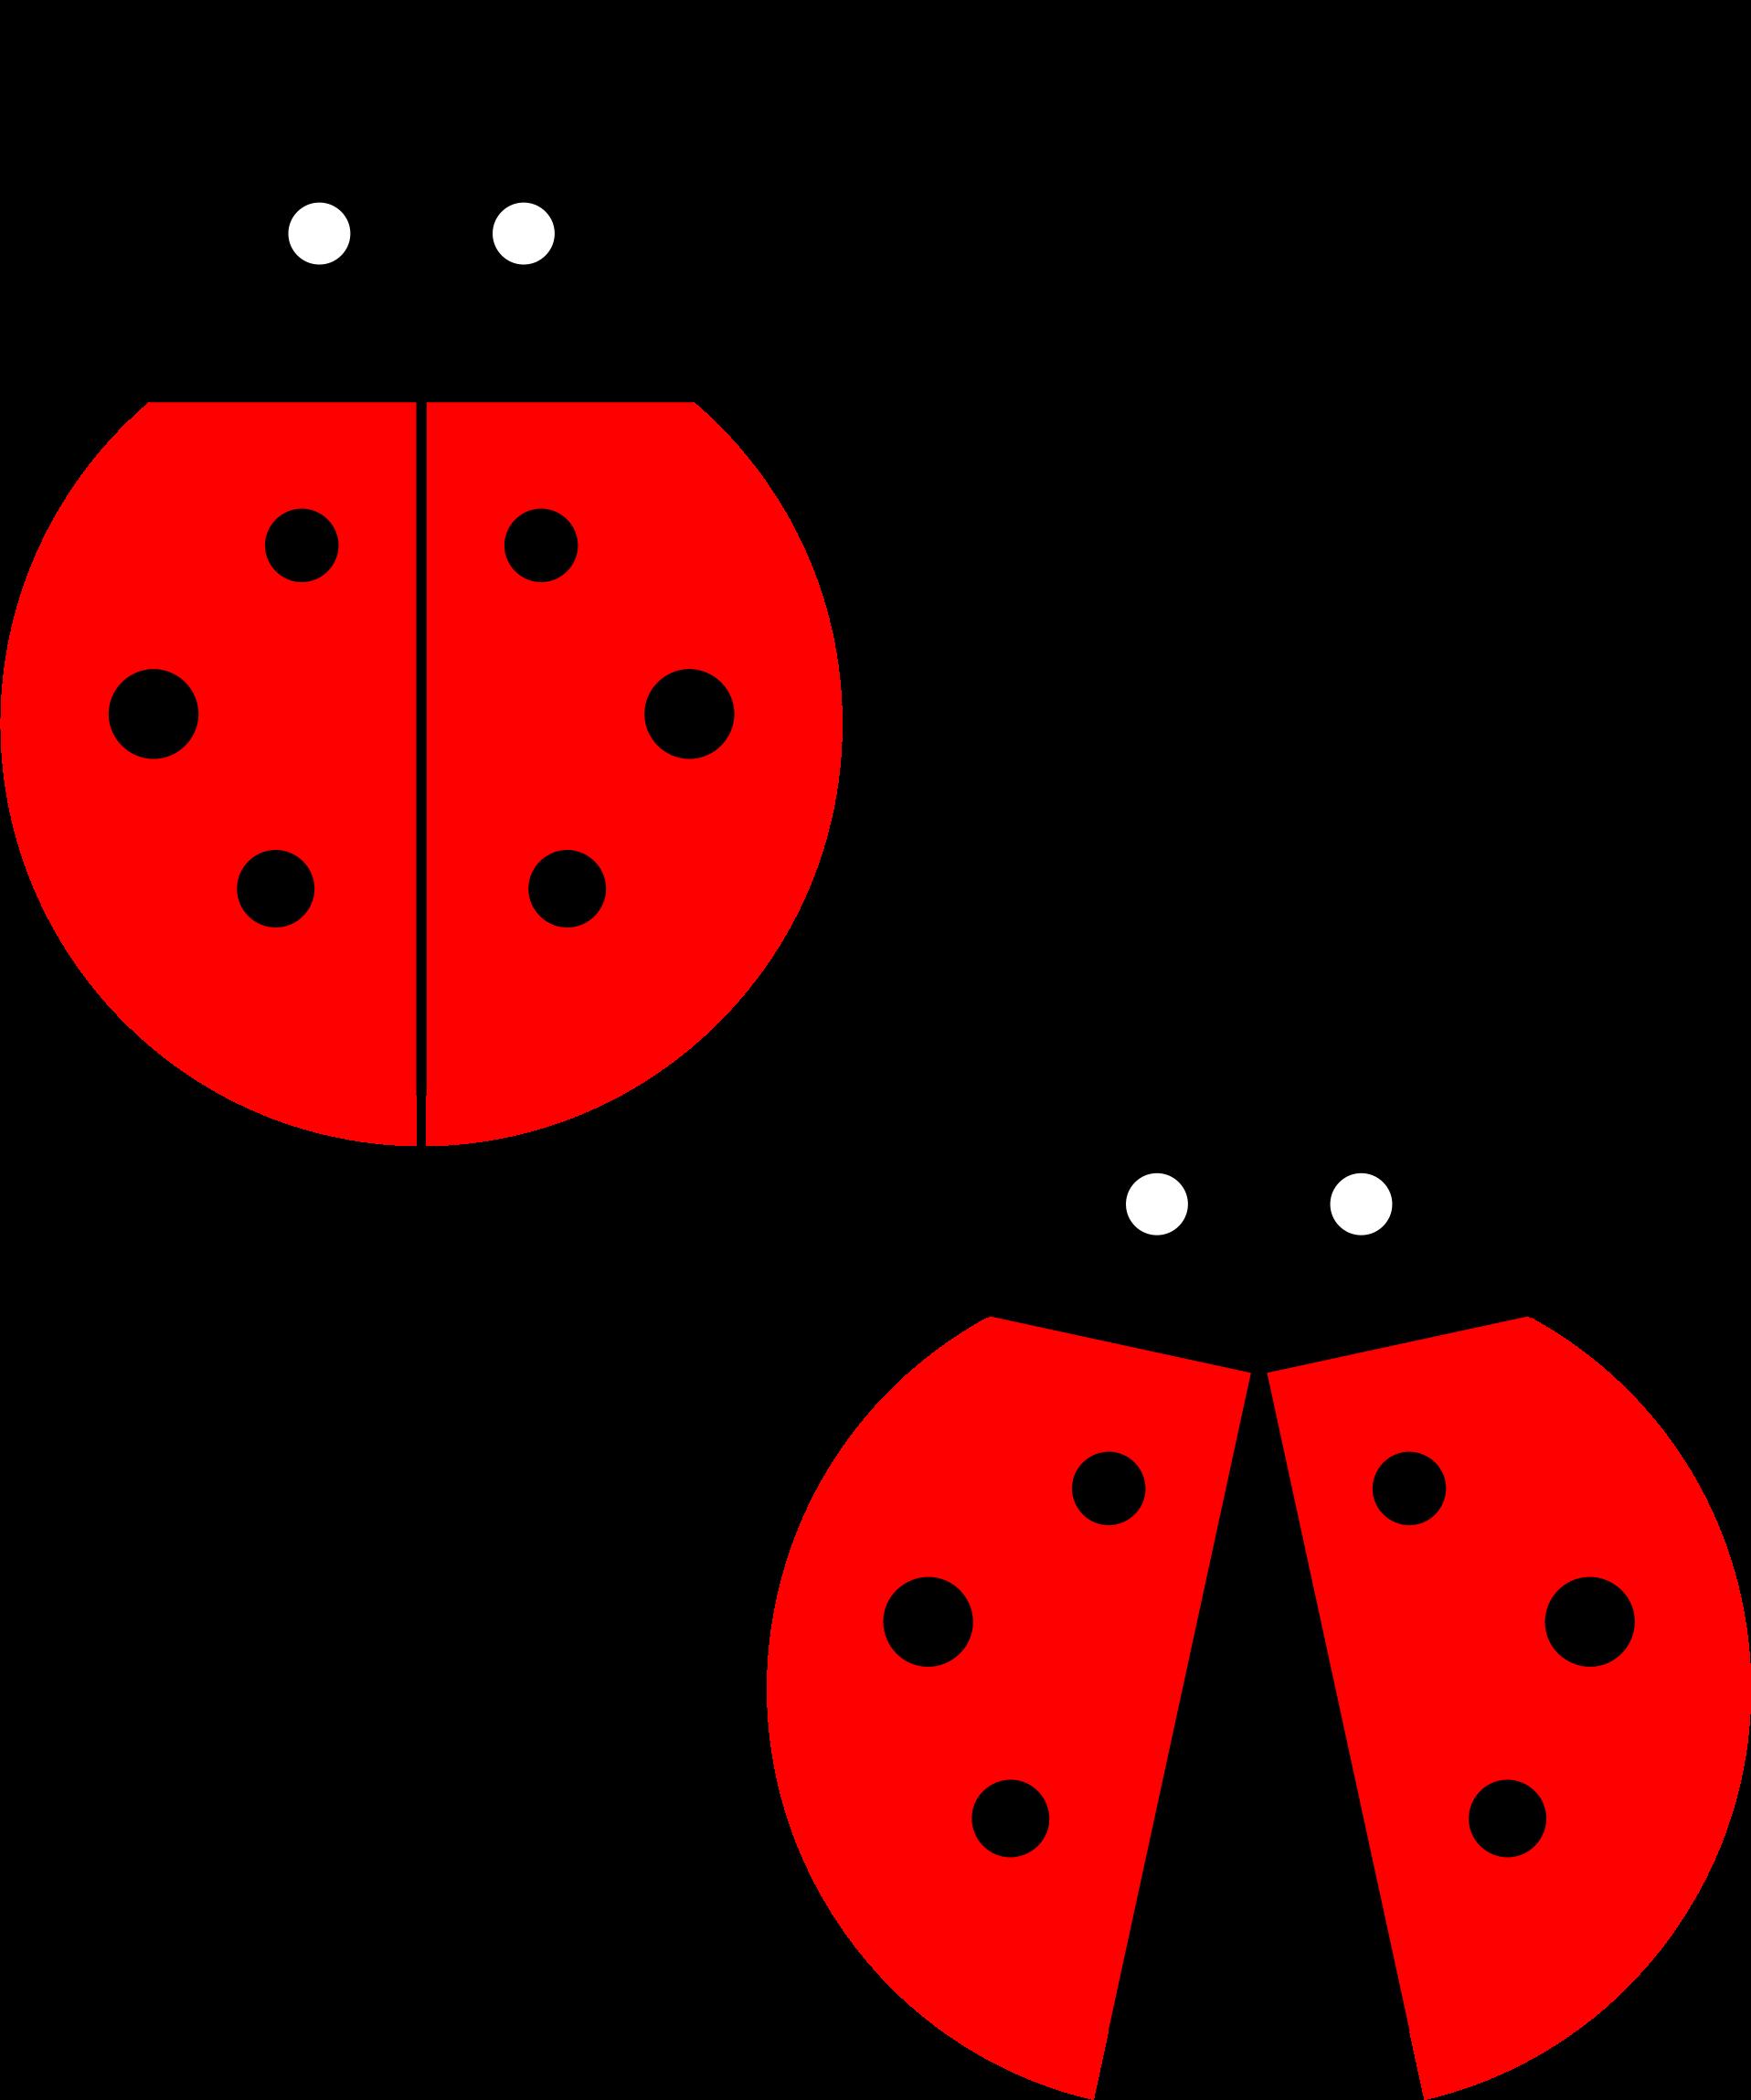 Wings clipart ladybug Cartoon Ladybug Free Art